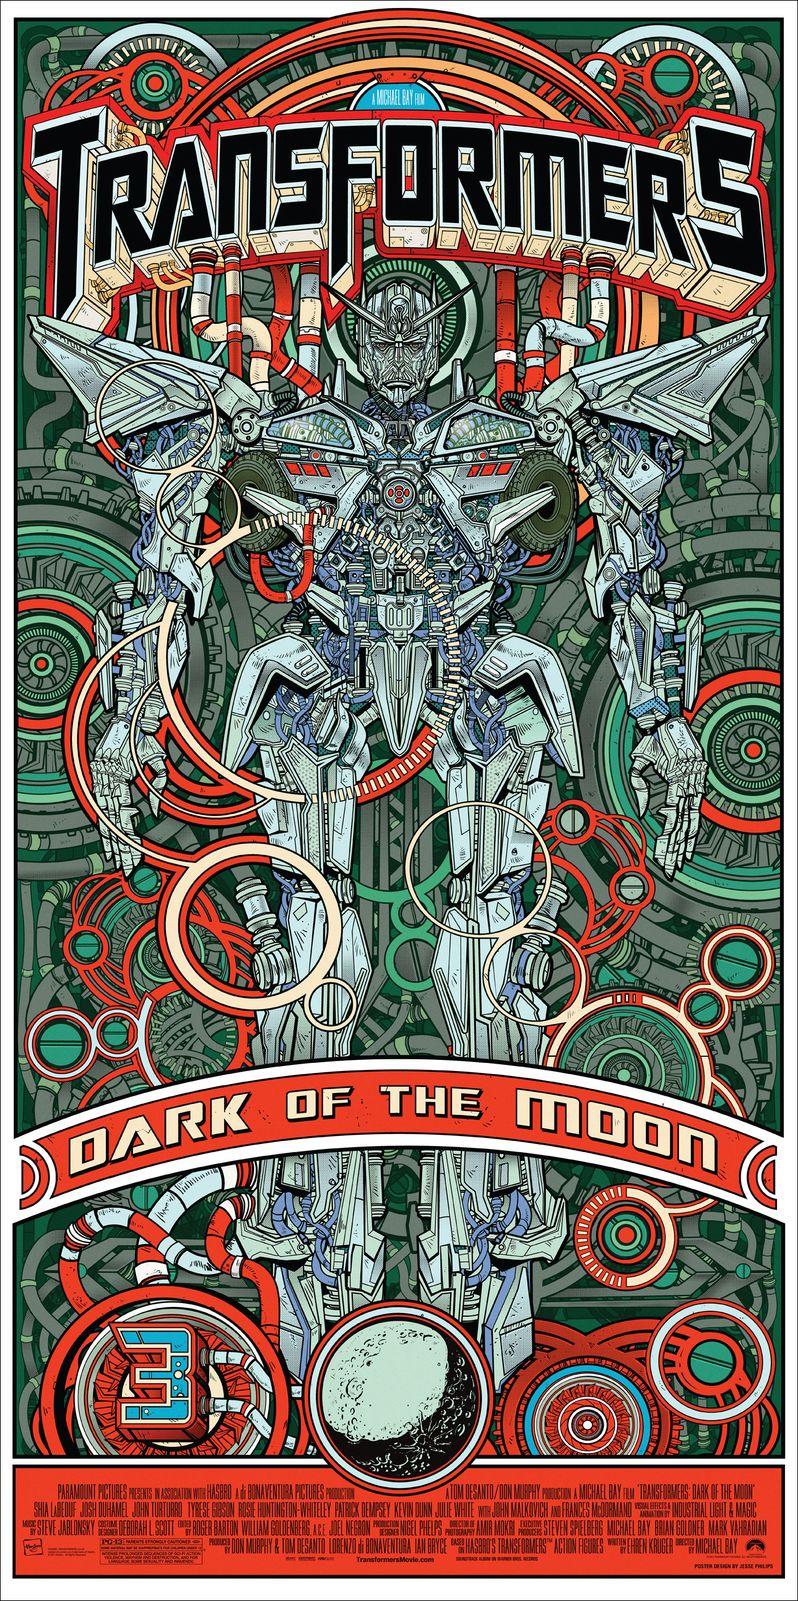 Transformers Dark of the Moon Alamo Drafhouse Poster #1